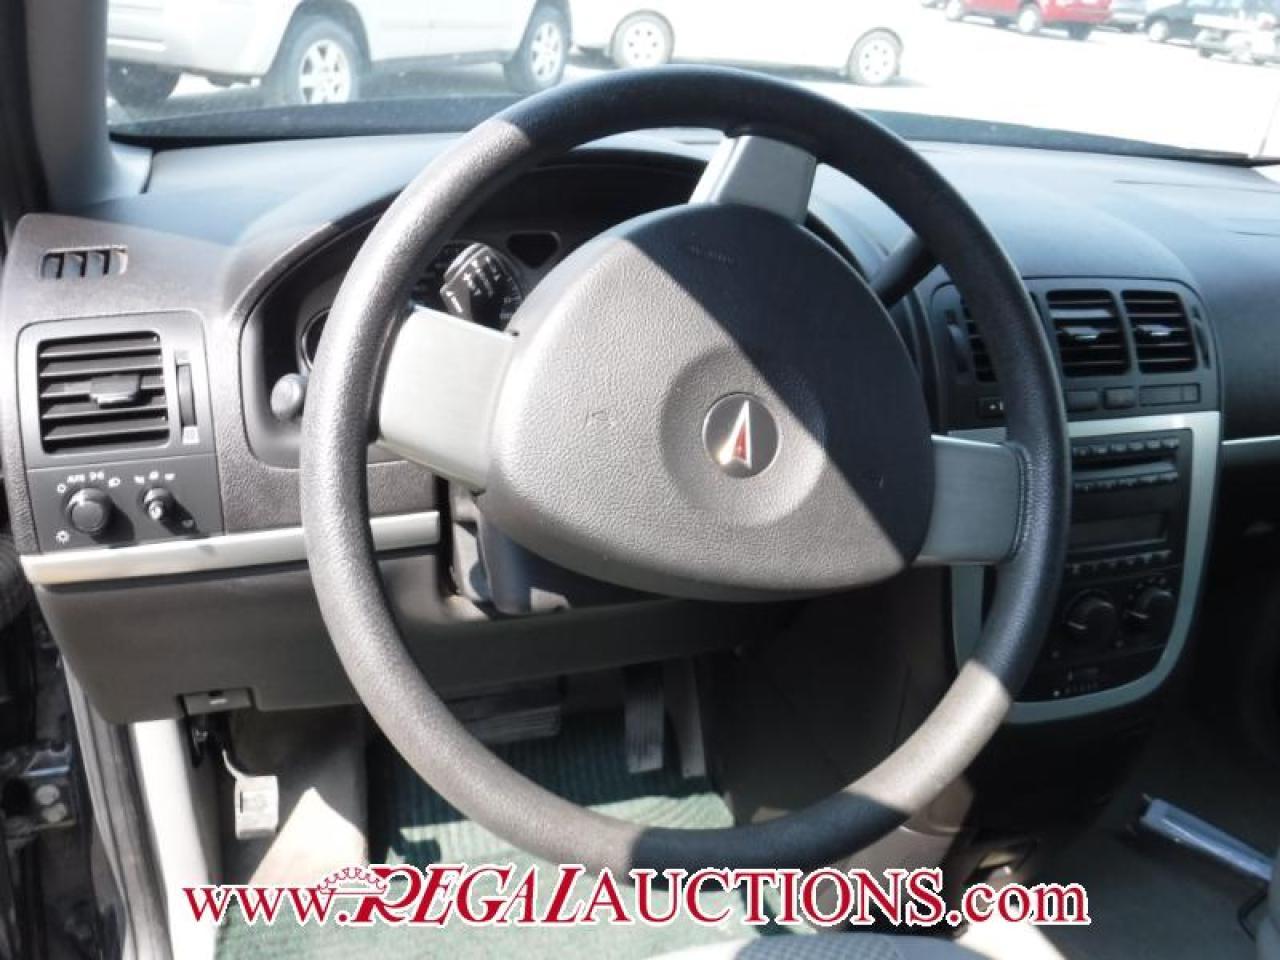 2005 Pontiac Montana Sv6 4D Ext Wagon